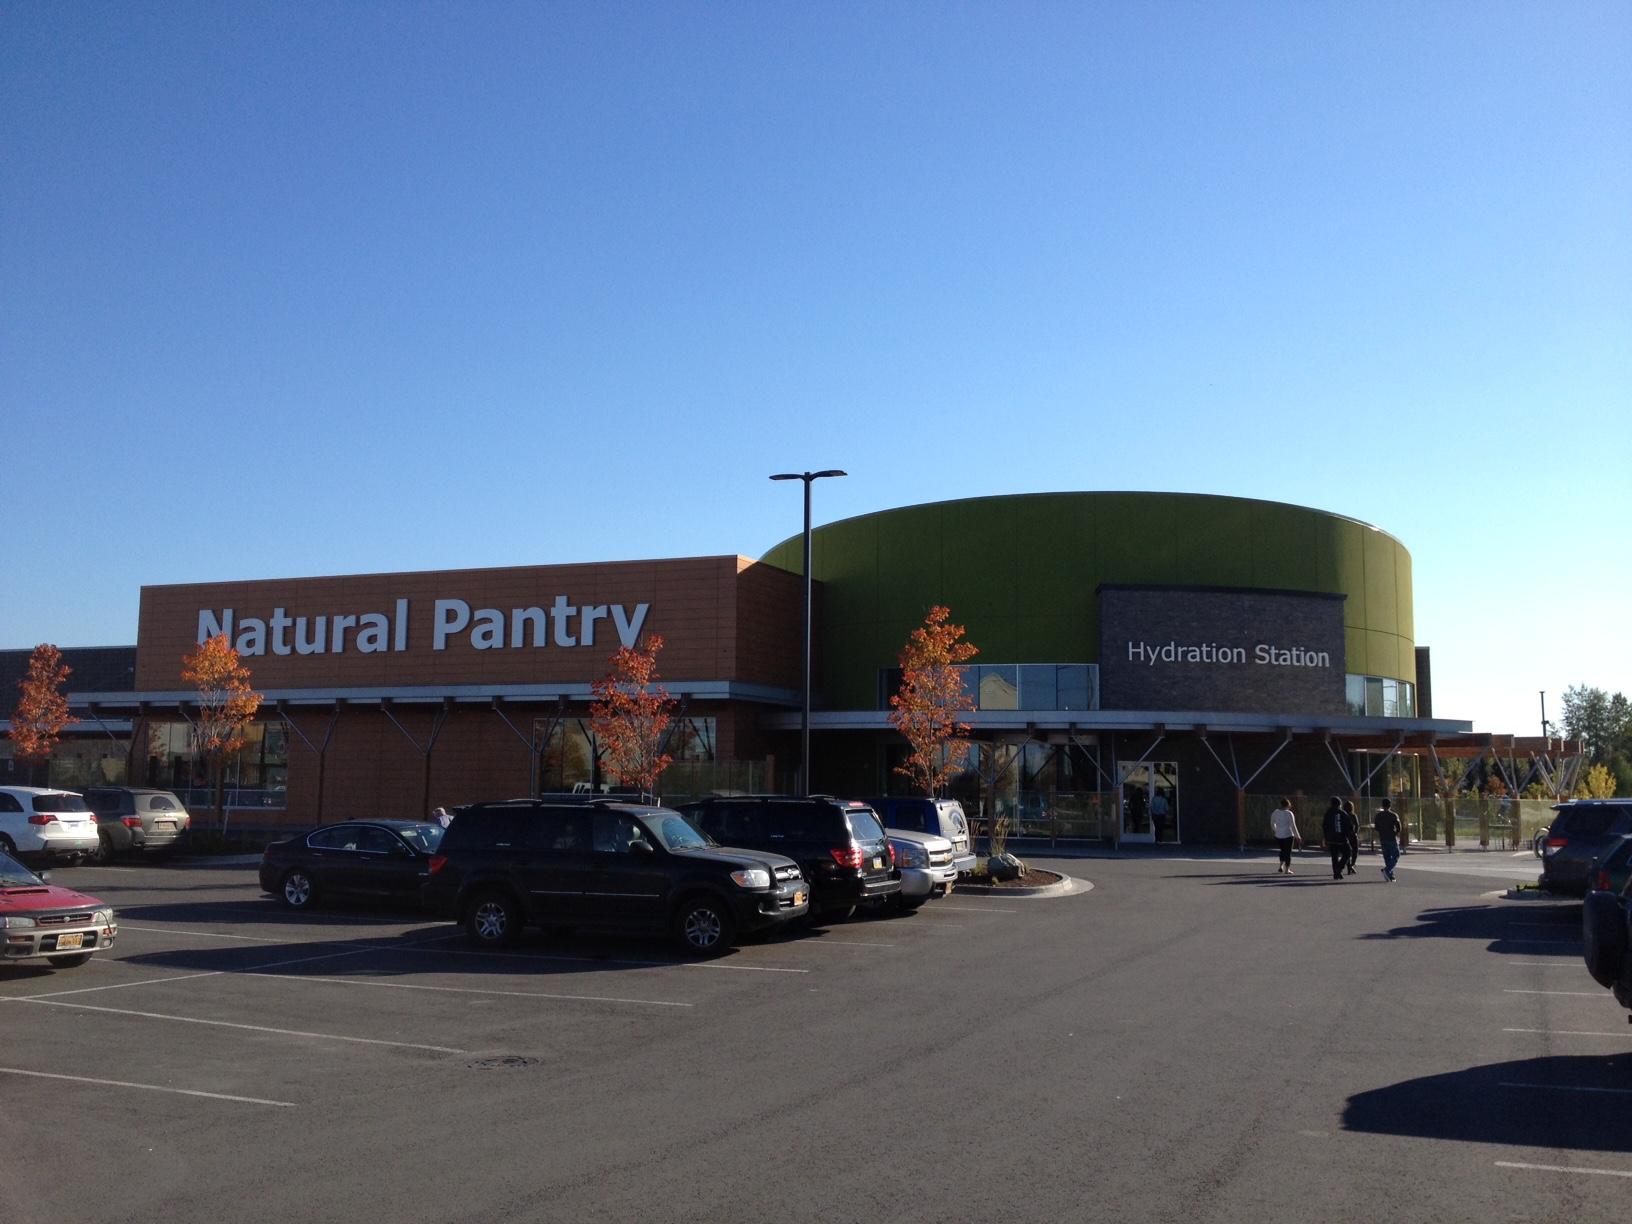 Natural Pantry Sept 14.JPG